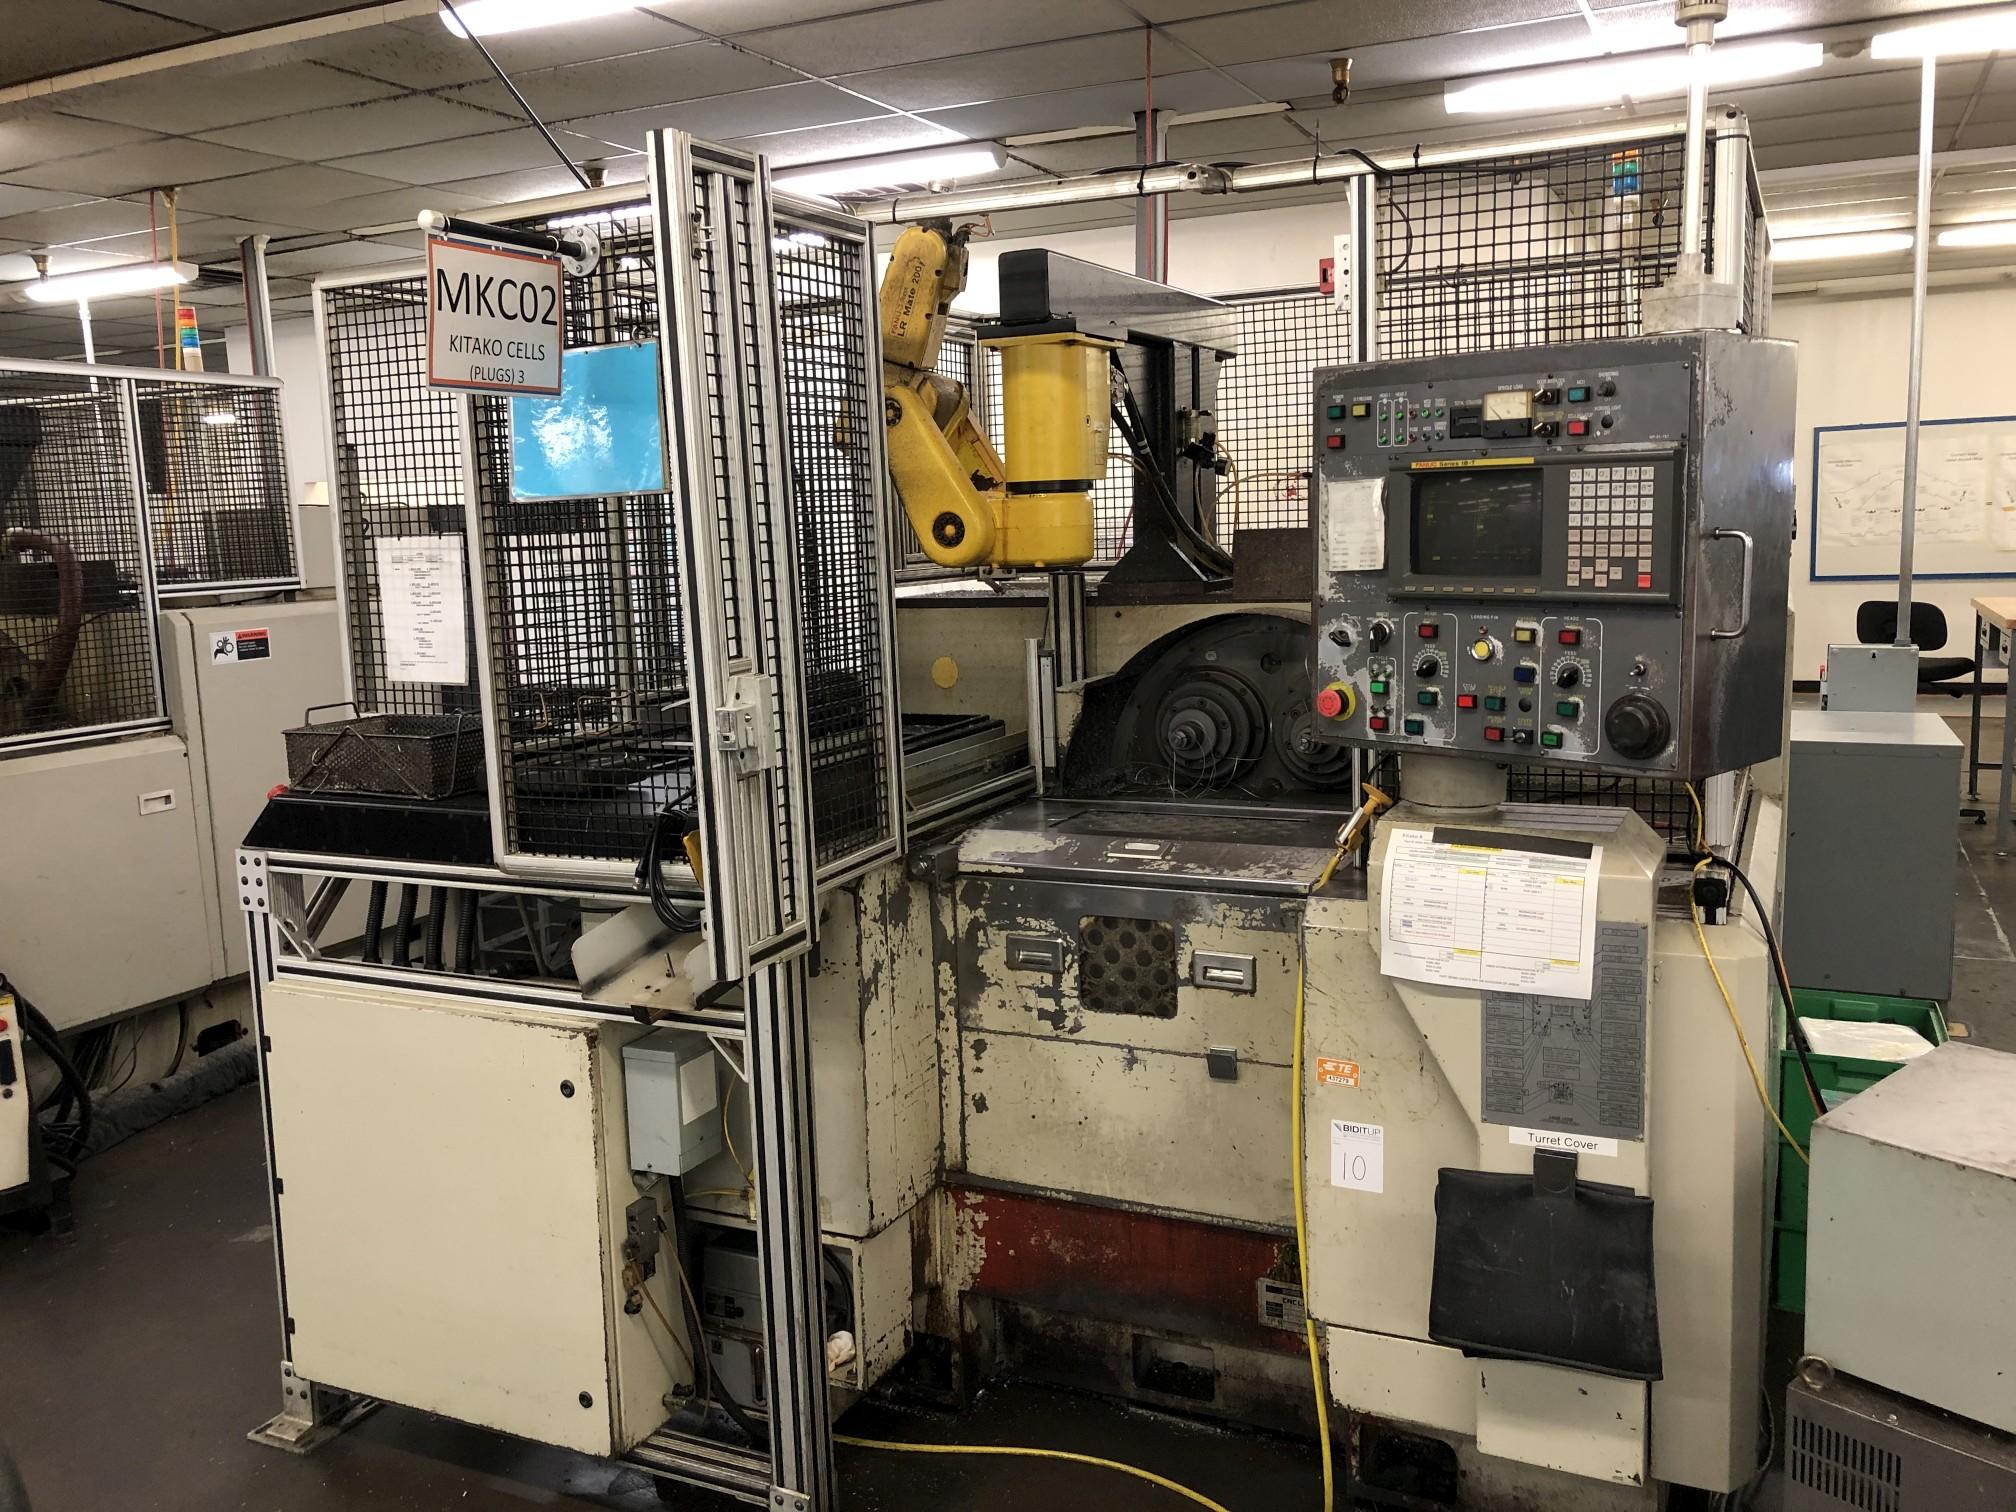 1999 Kitako MT4-200 Multi-Spindle CNC Turning Mill